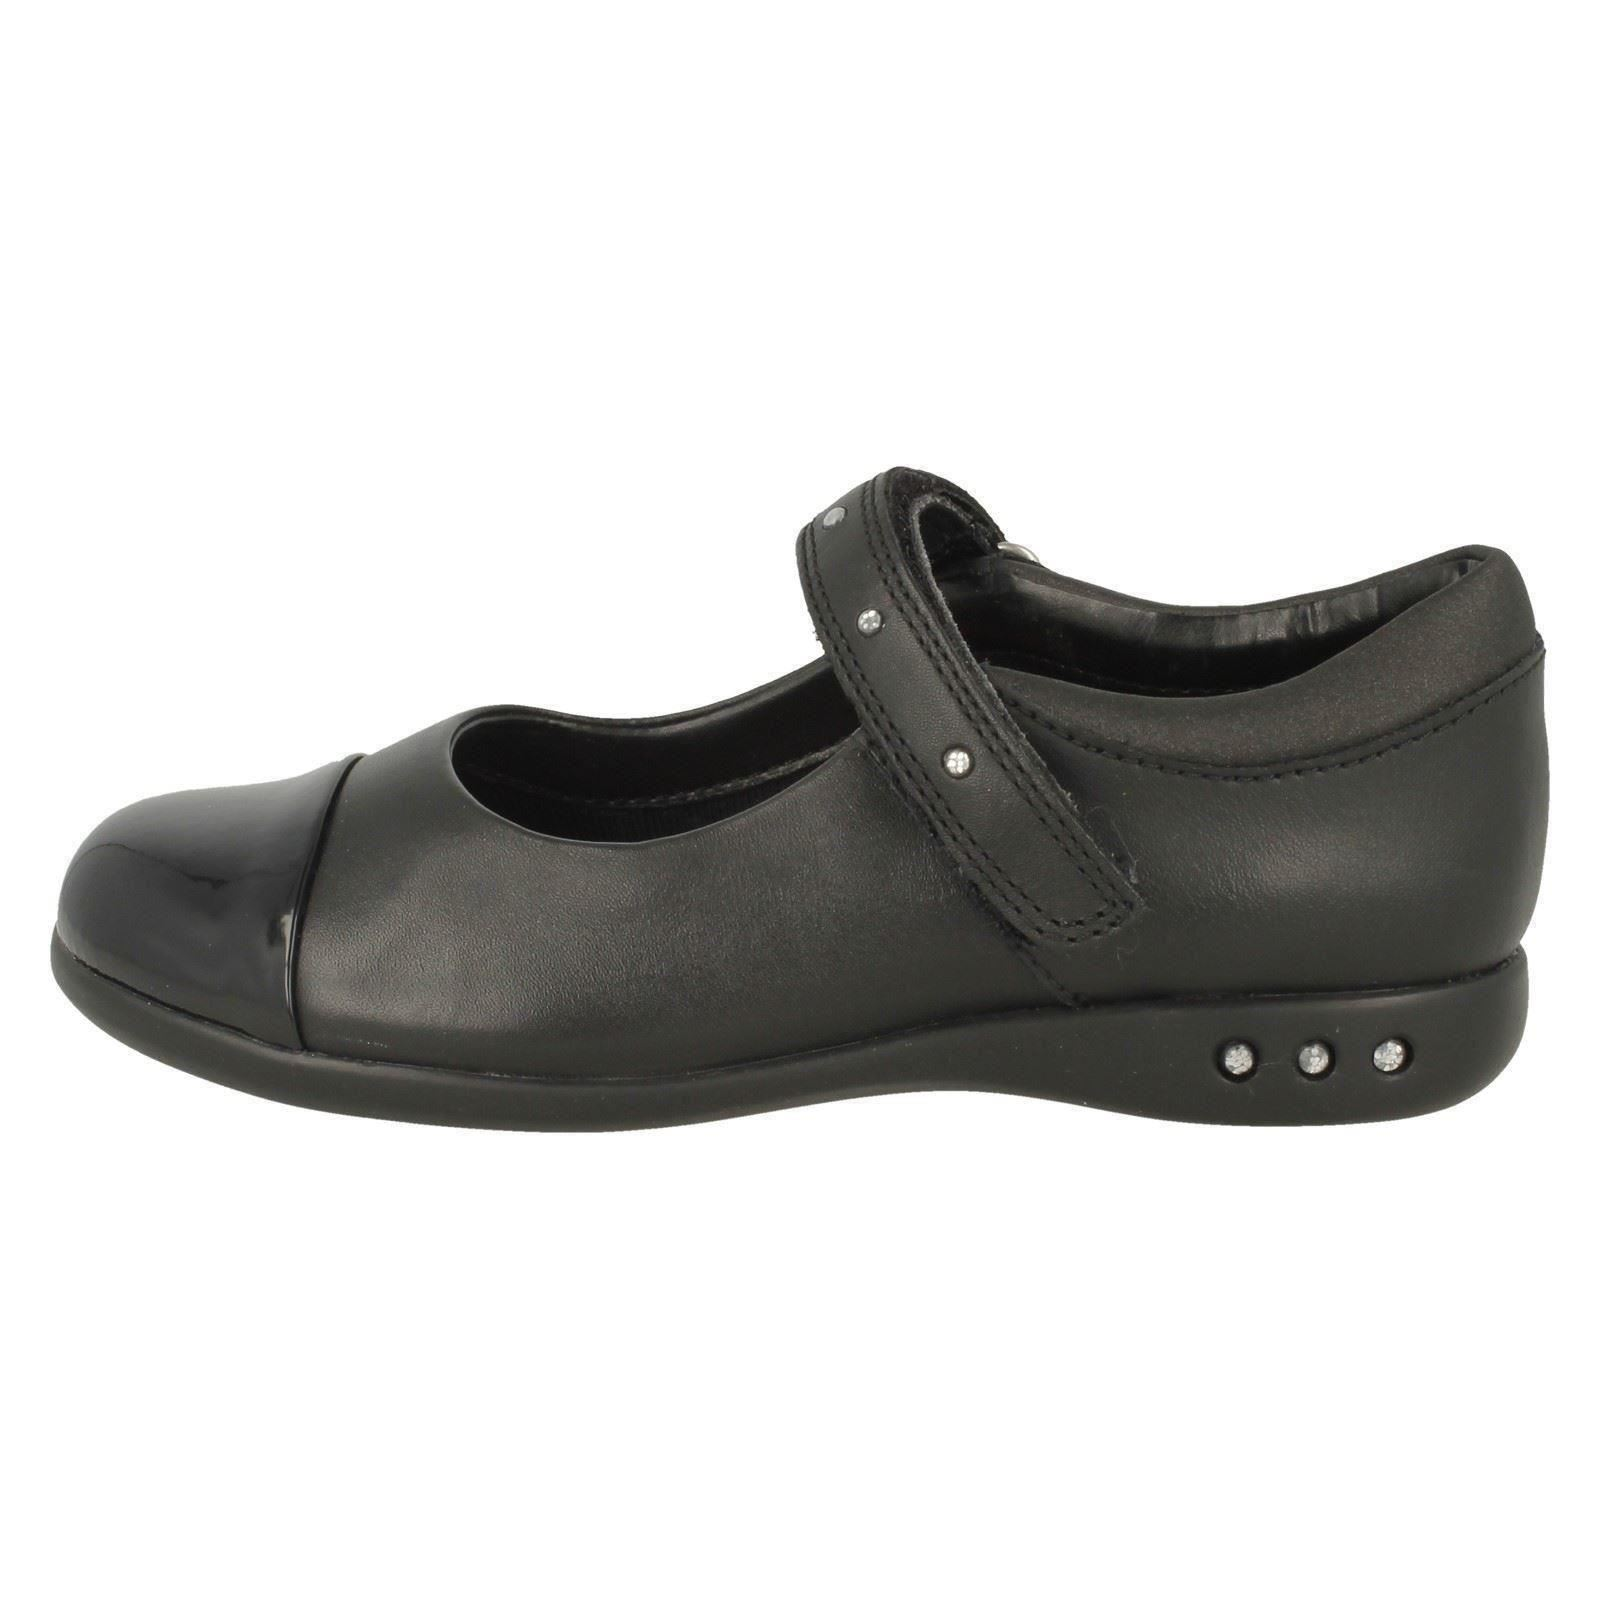 Negro Walk' Strap 'prime Las niñas School Clarks Shoes Studded qS6Bw8v